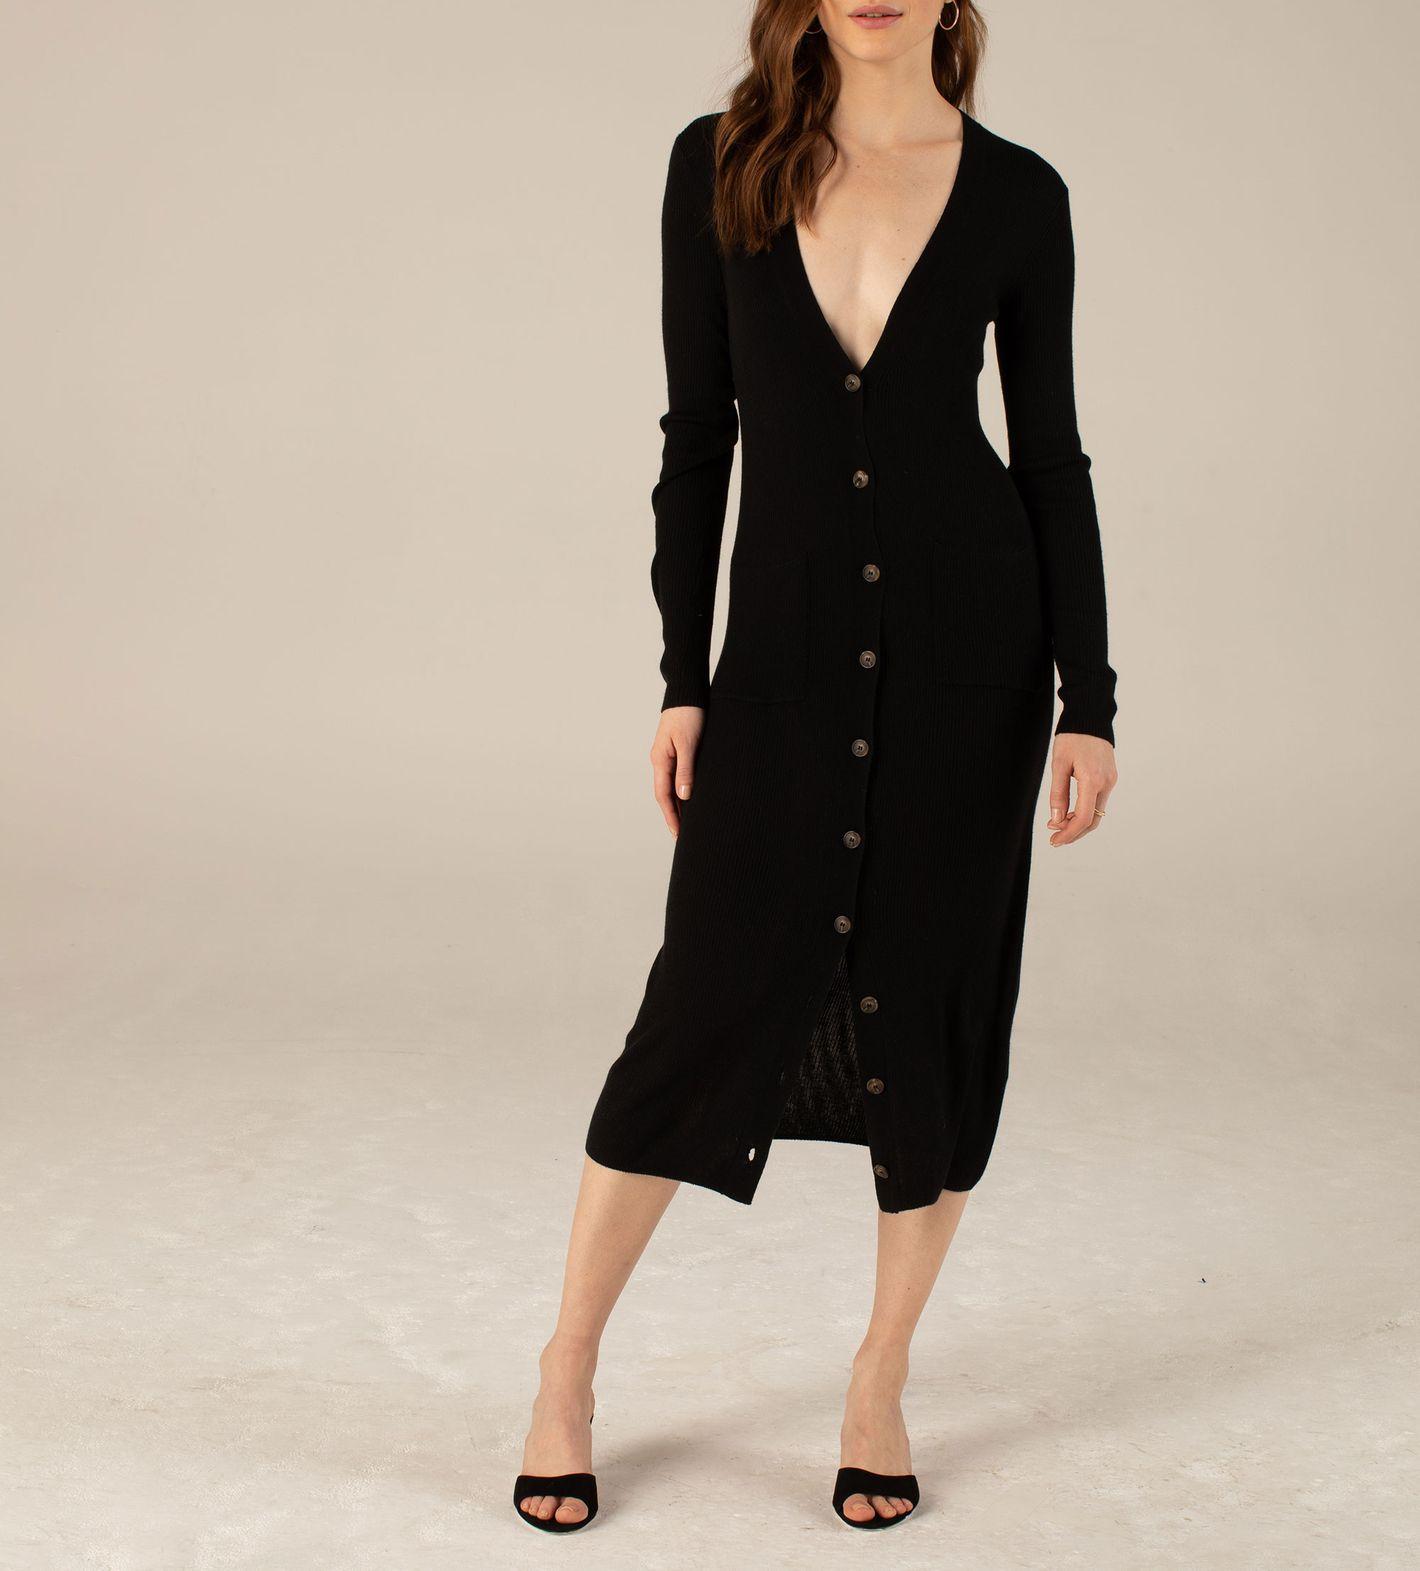 Long Sleeve Cardigan Dress in Black